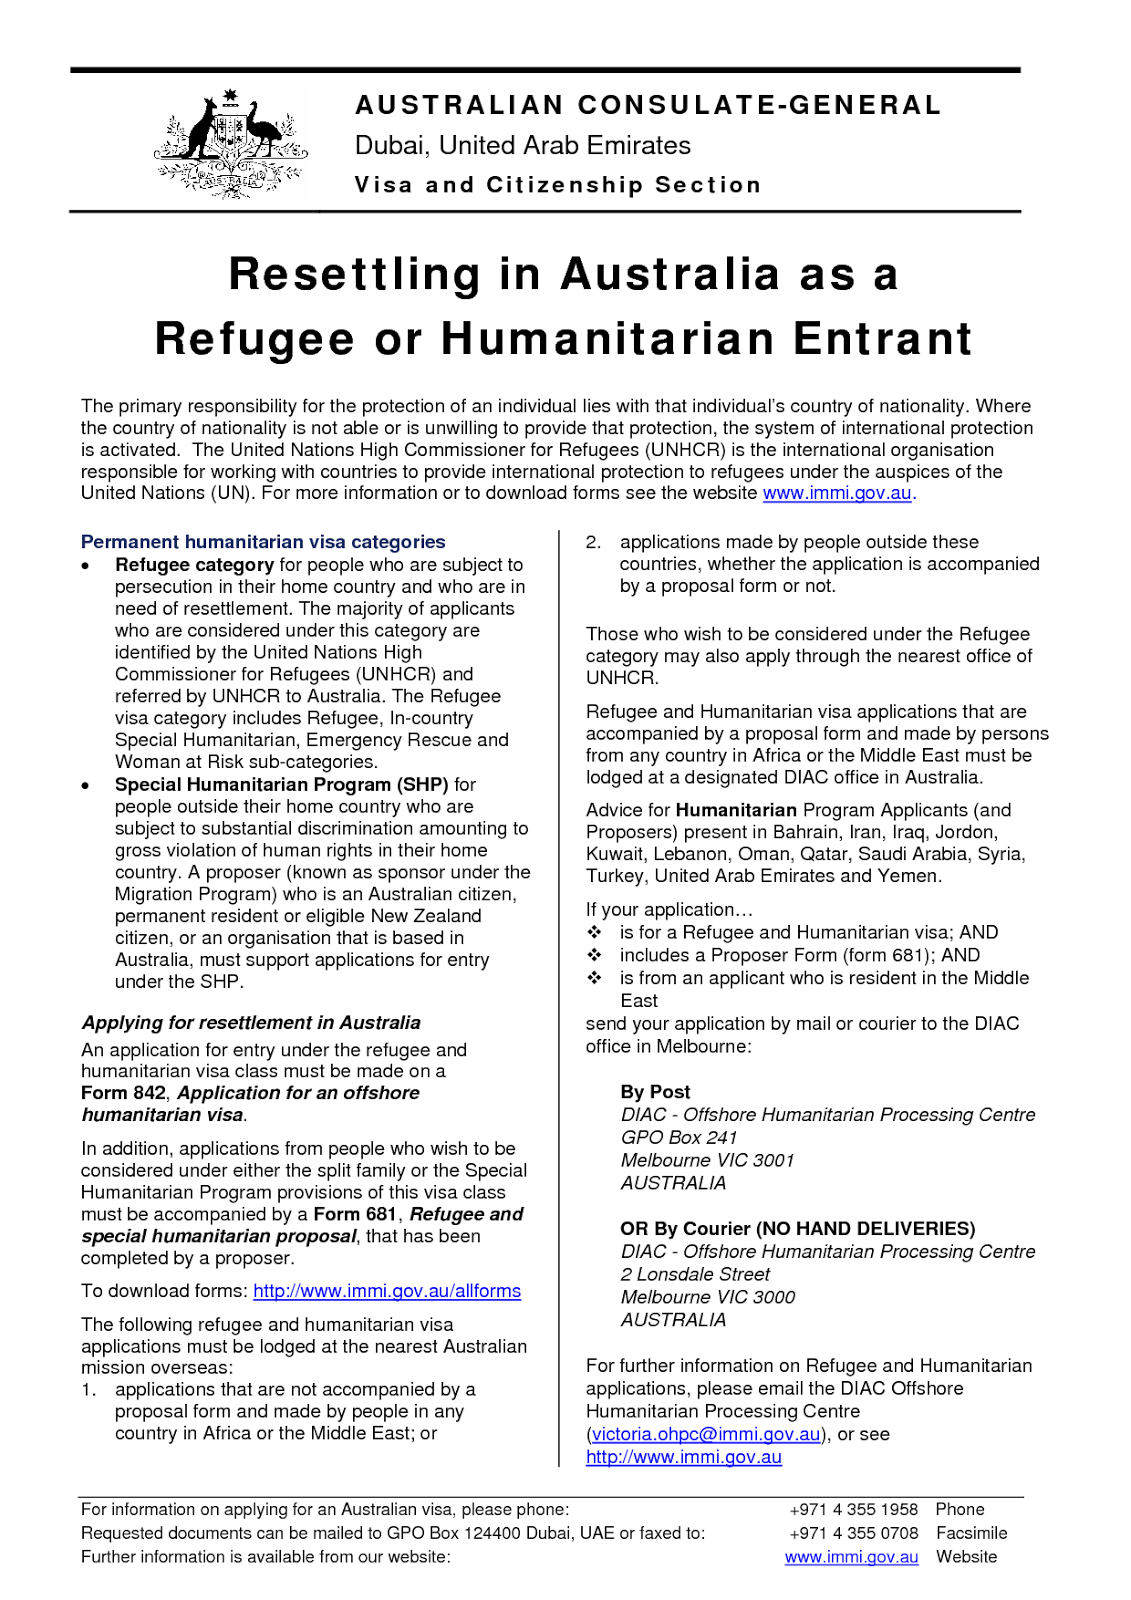 Australia Form 842 Vai ~ Thu Tatuam (Siyin News)